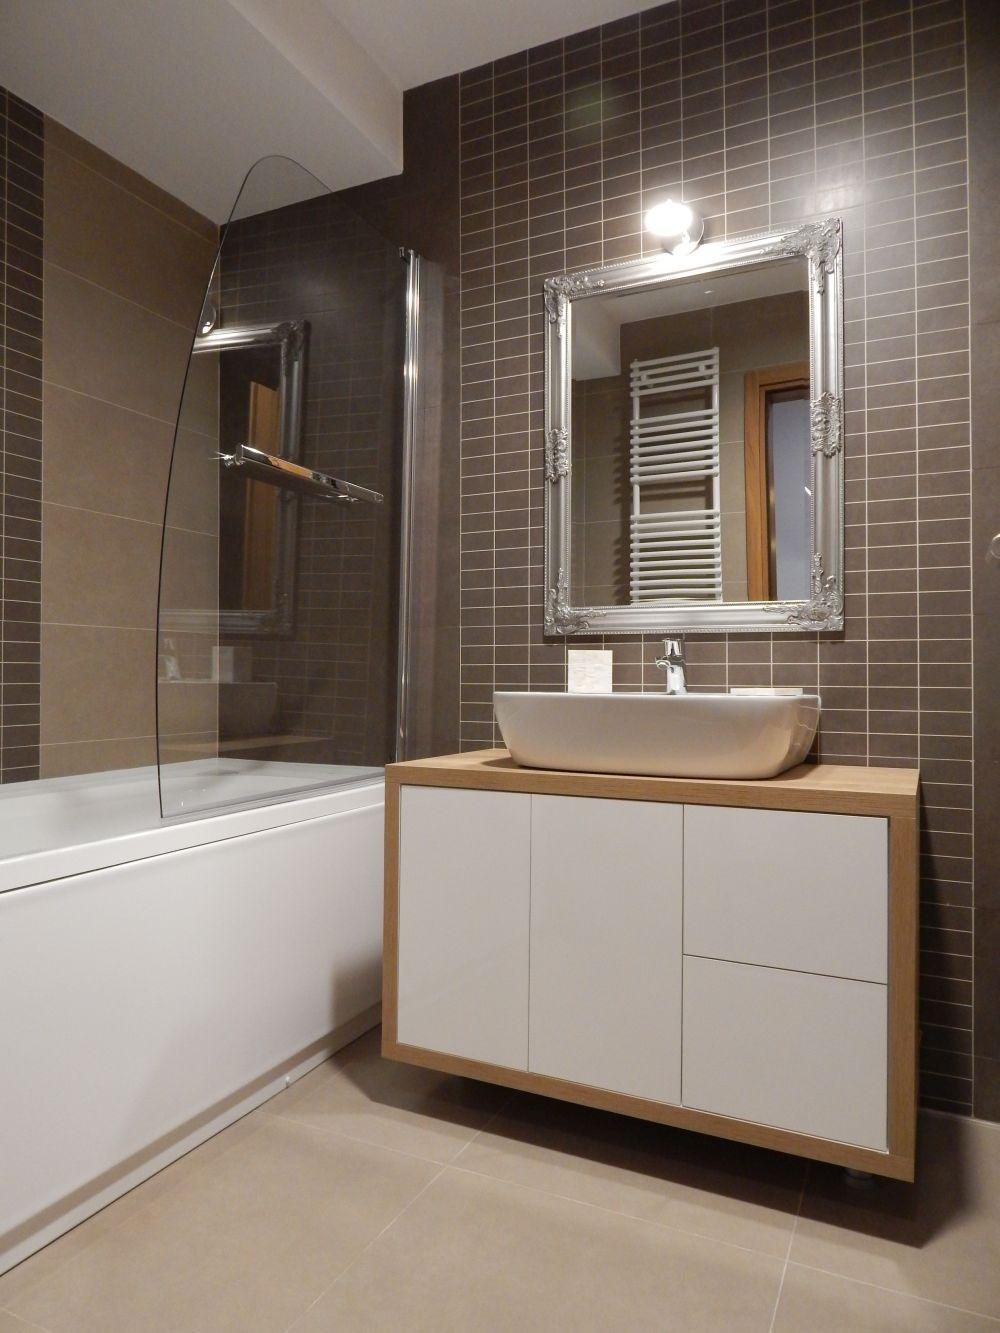 adelaparvu.com despre amenajare apartament 3 camere Bucuresti, 83 mp, Design arh. Sergiu Califar, Pure Mess (17)